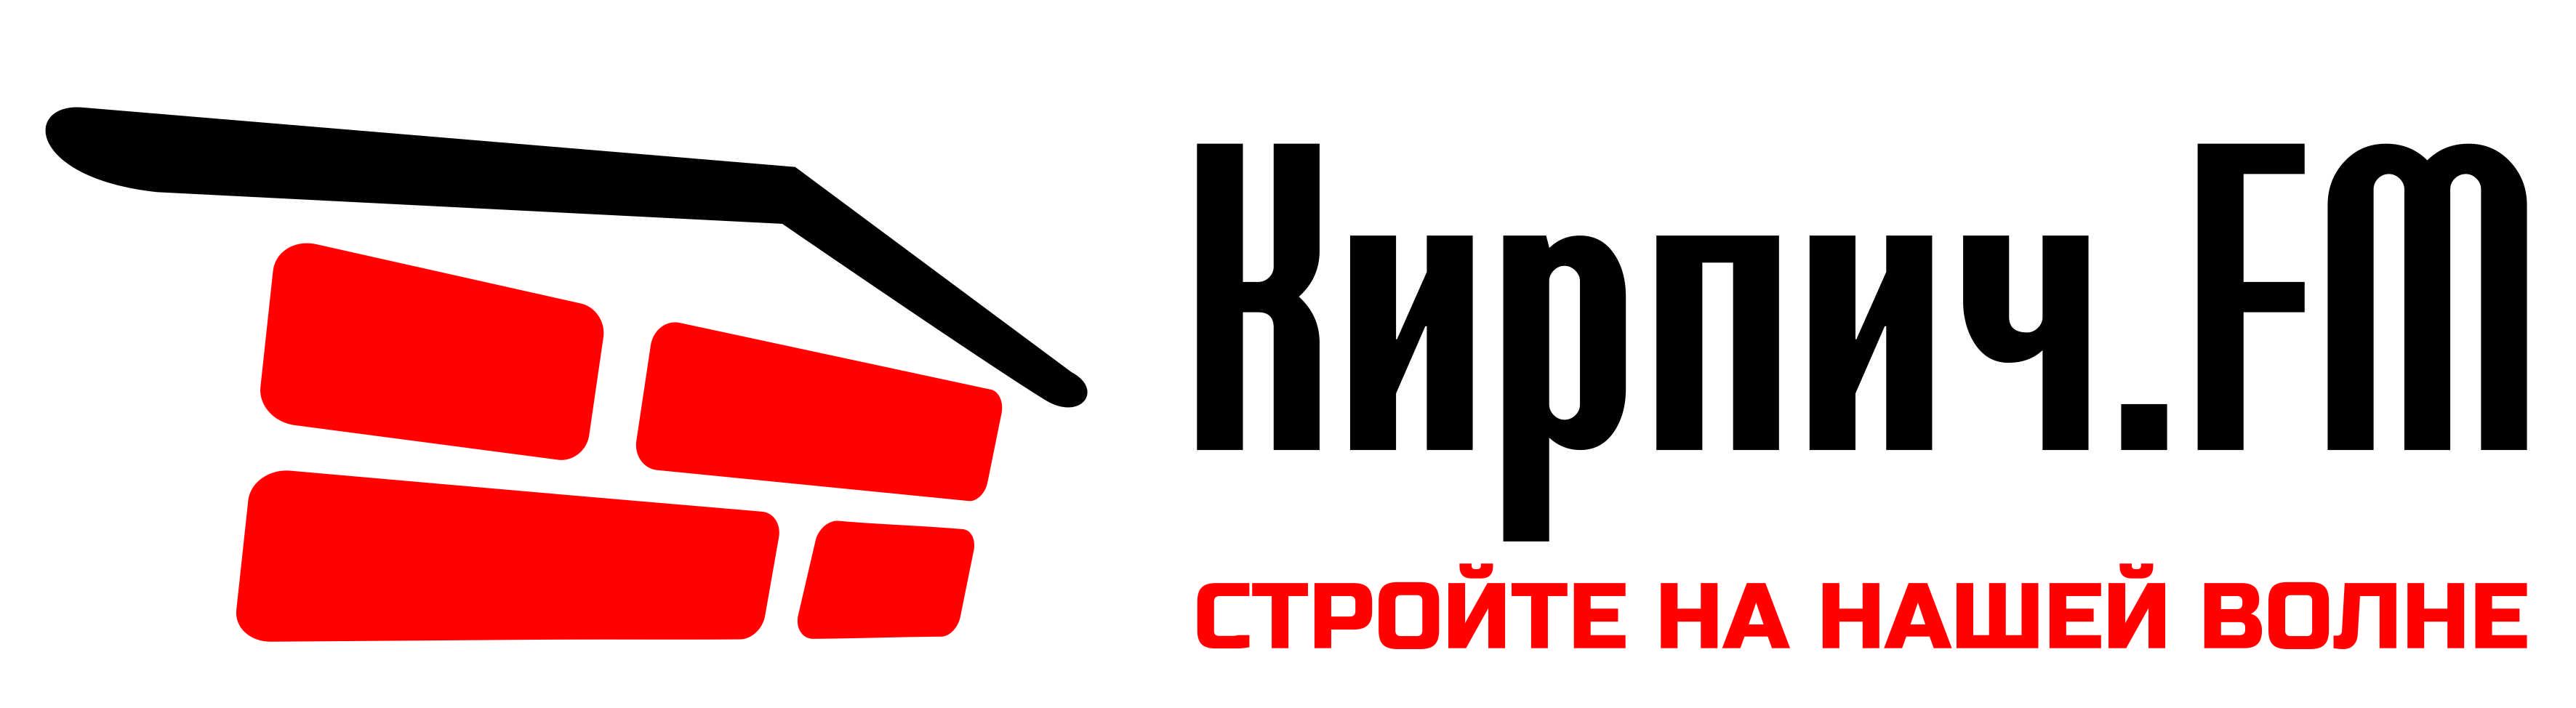 Кирпич.FM : СТРОЙТЕ НА НАШЕЙ ВОЛНЕ